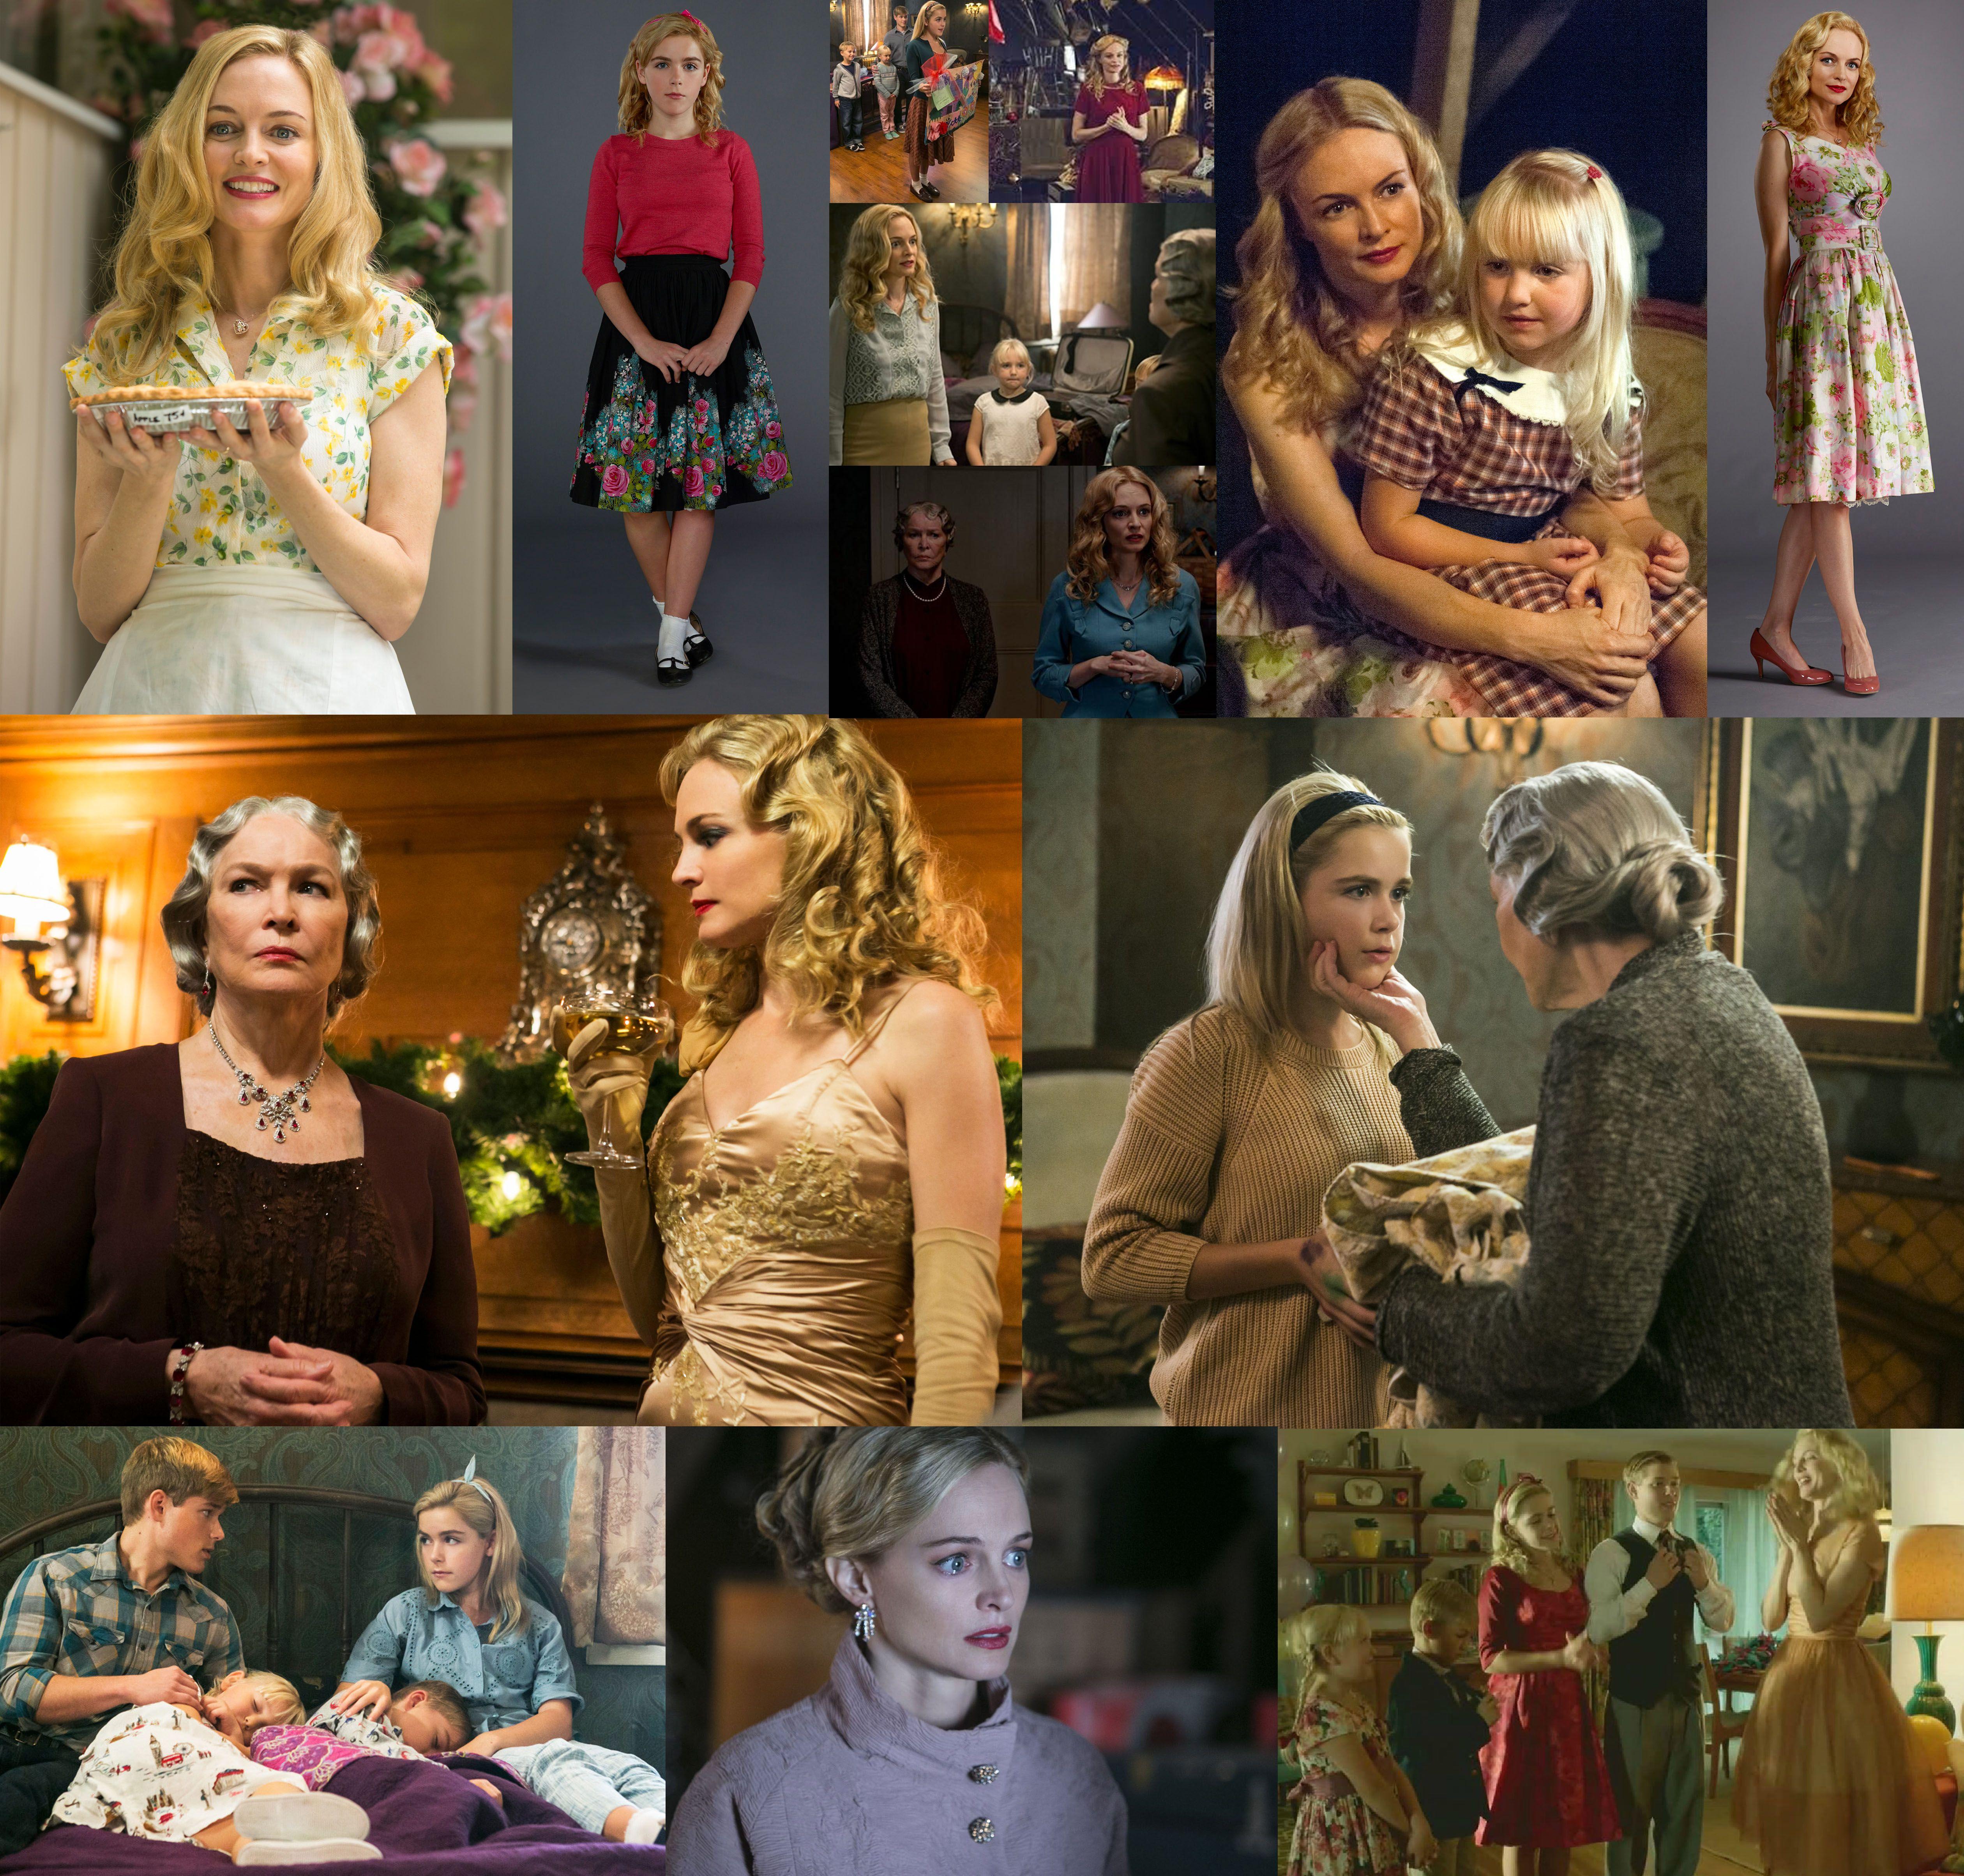 Flowers In The Attic Flowers In The Attic Movie Fashion My Sweet Audrina